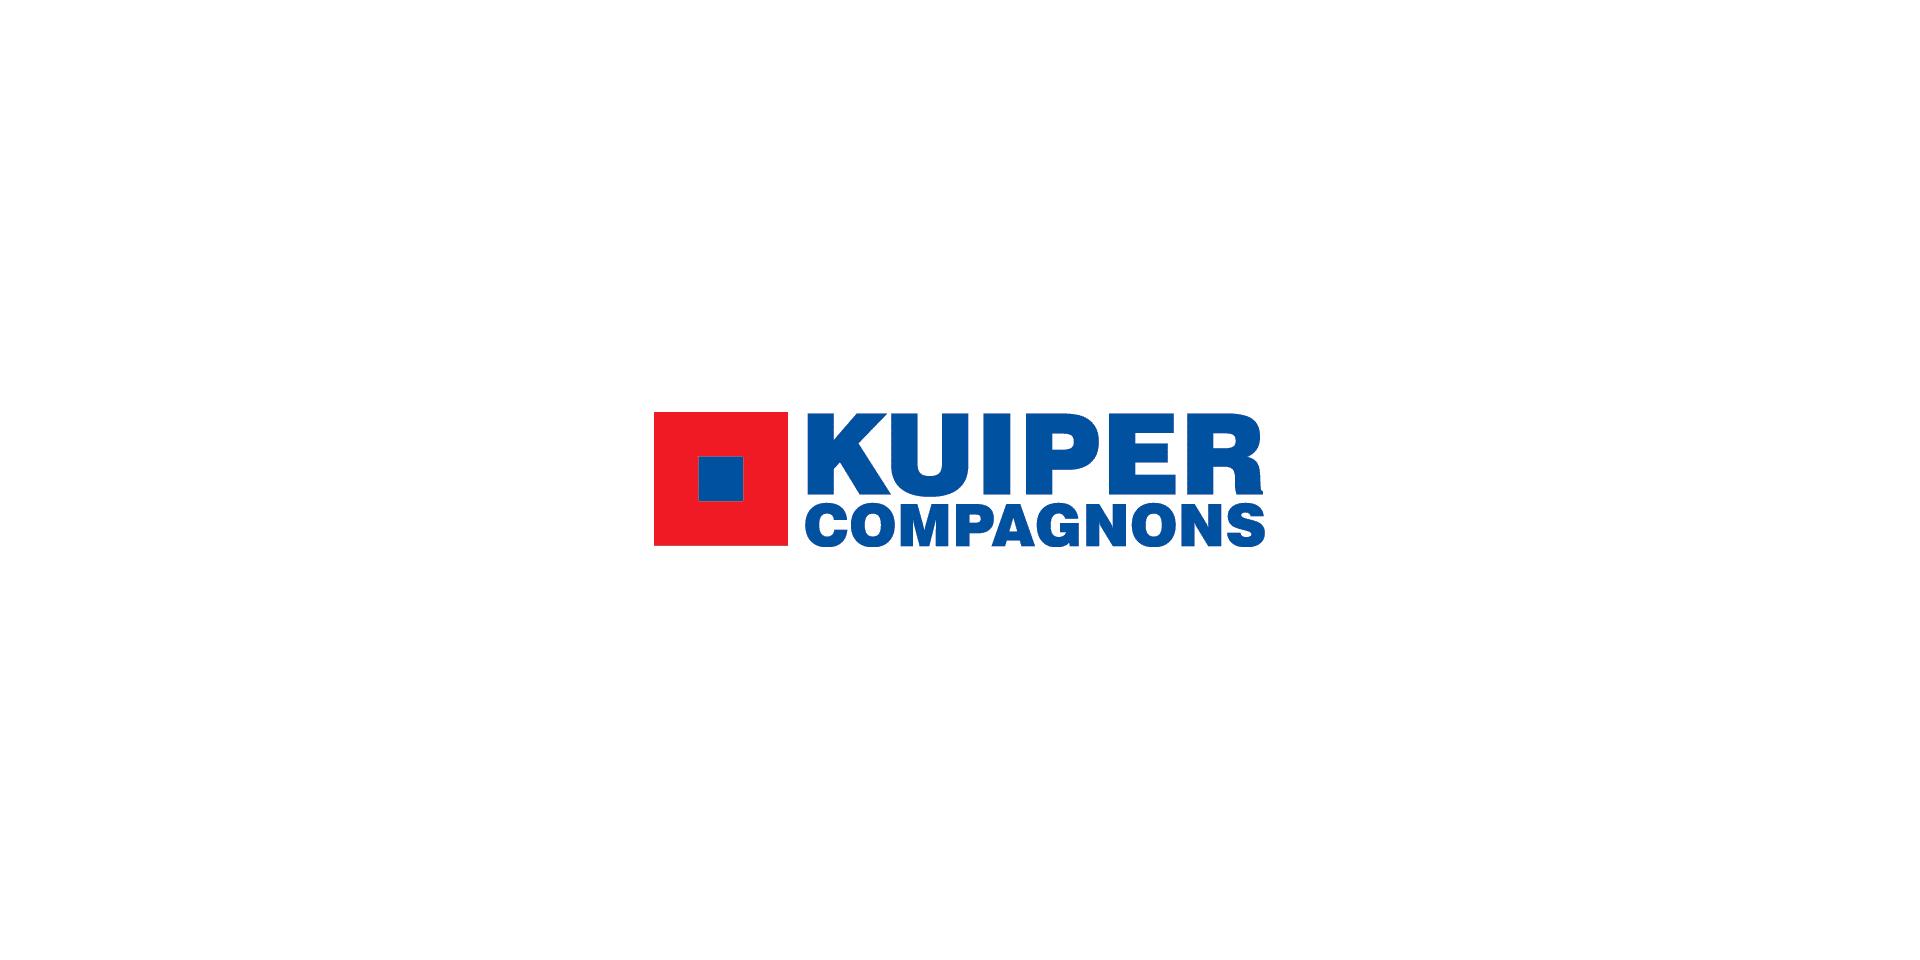 Kuiper Compagnons - Rotterdam